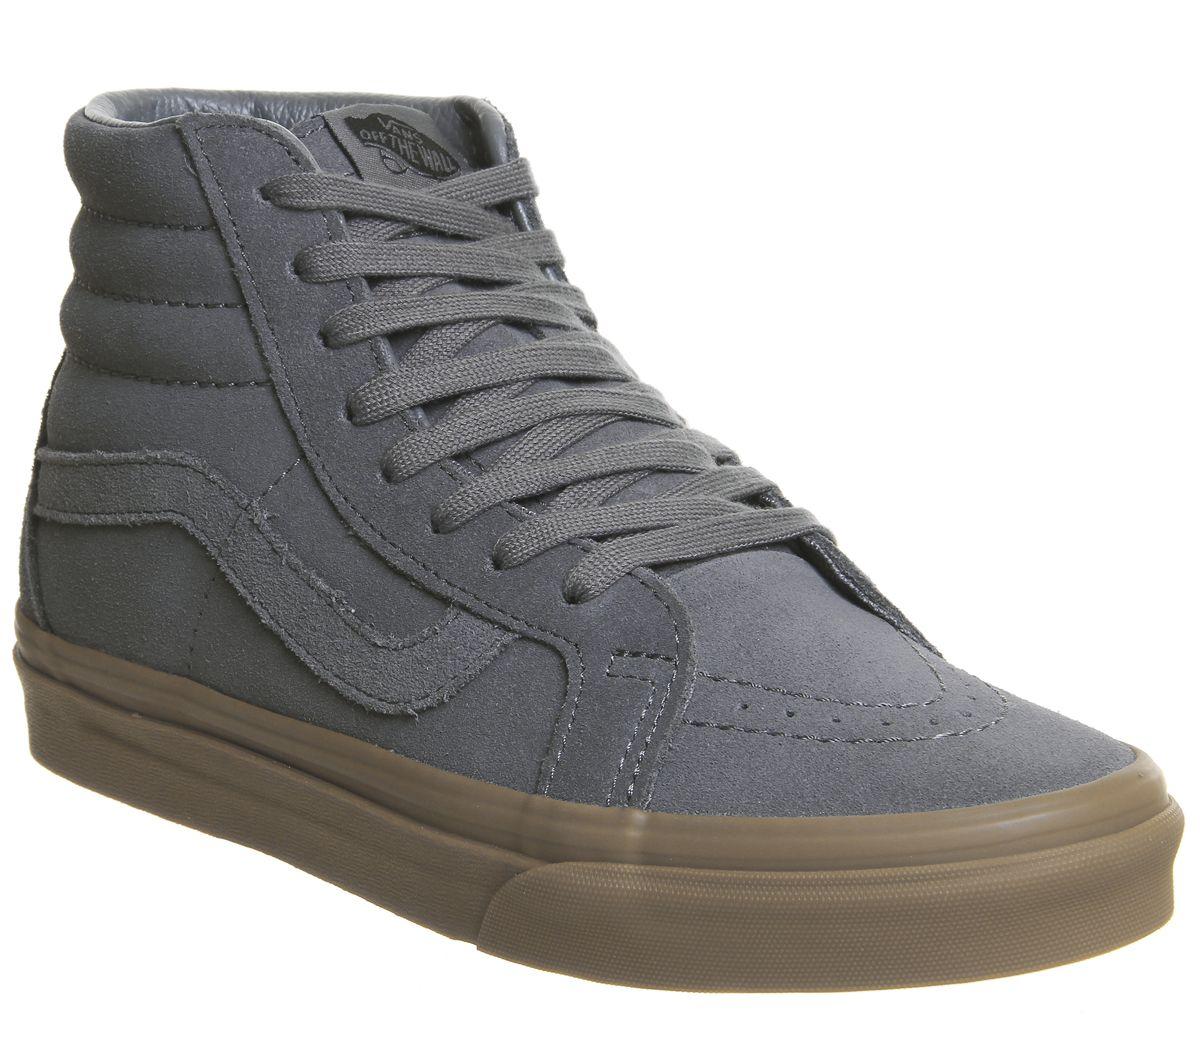 7f10dcb31dca7e Vans Sk8 Hi Trainers Grey Suede Gum Exclusive - Unisex Sports